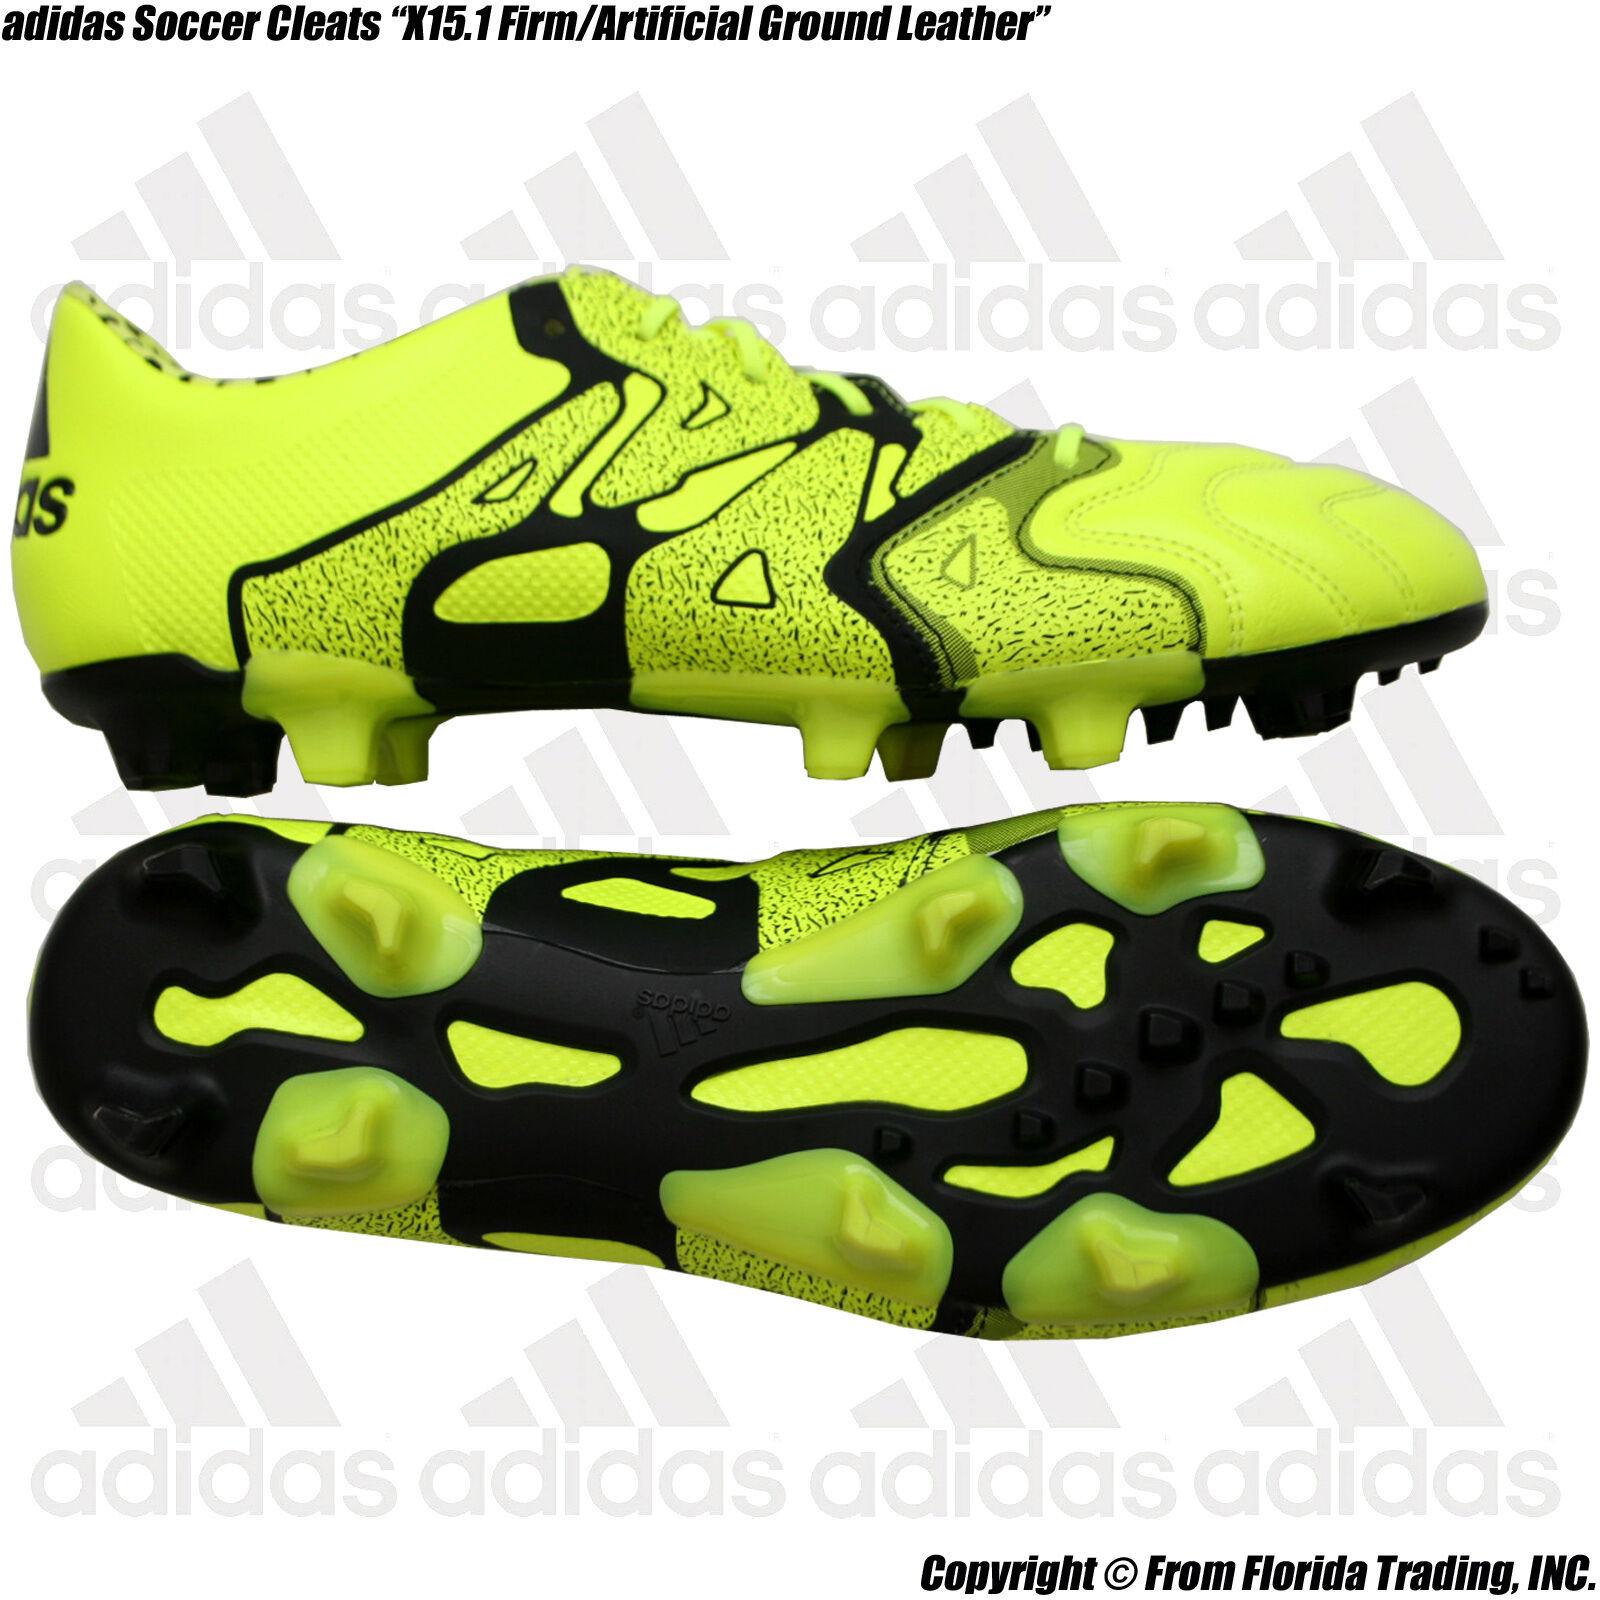 Adidas Uomo Soccer Cleats